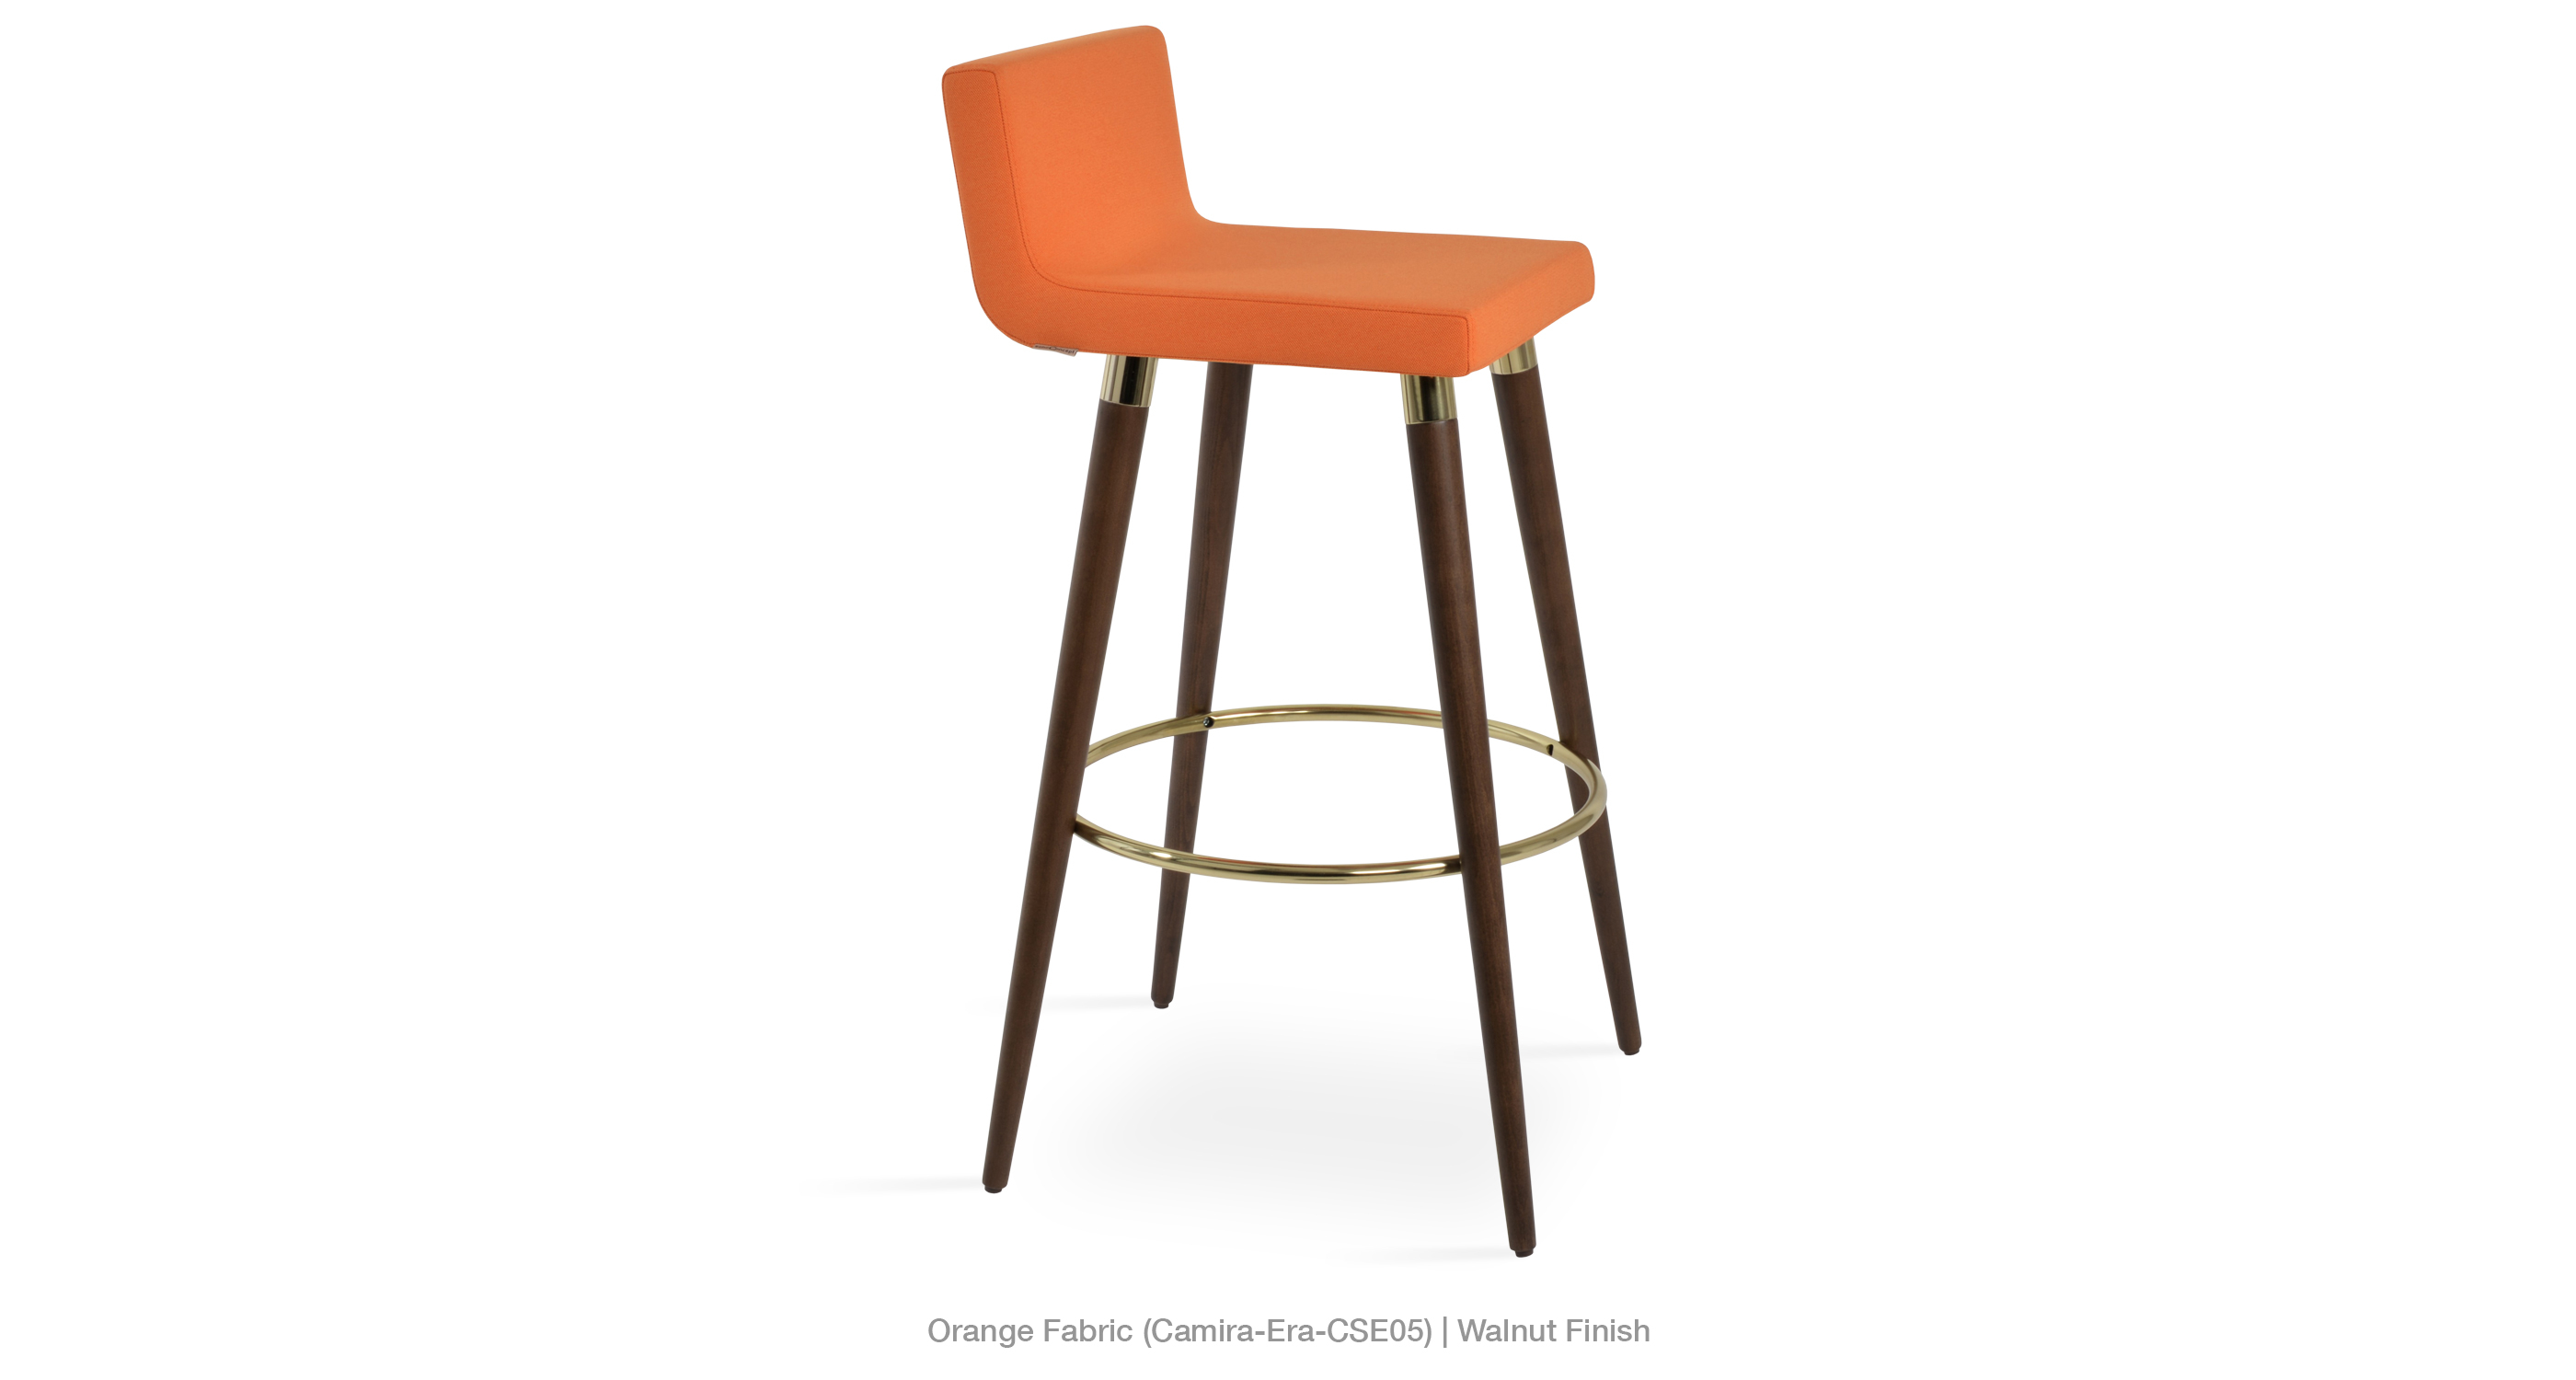 Stupendous Dallas Dr Wood Stools Contemporary Bar Stools Sohoconcept Frankydiablos Diy Chair Ideas Frankydiabloscom